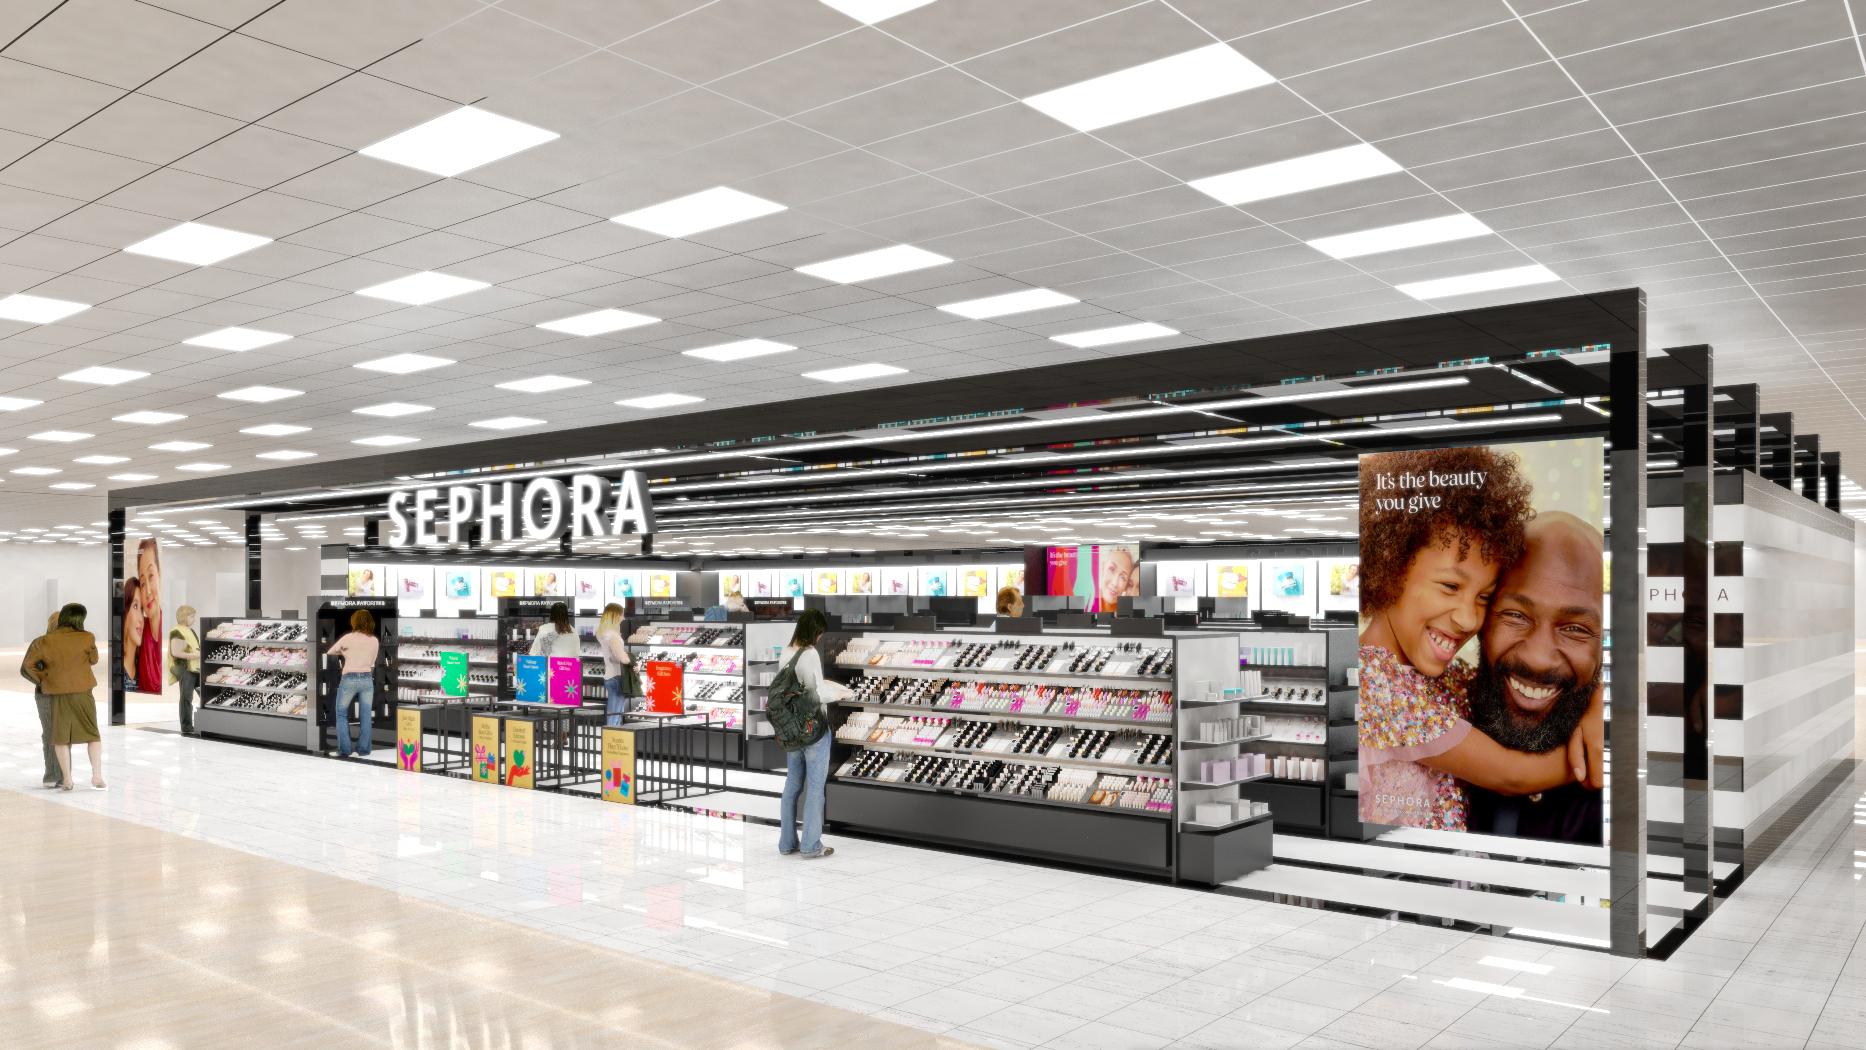 Sephora is opening up mini shops inside Kohl's stores